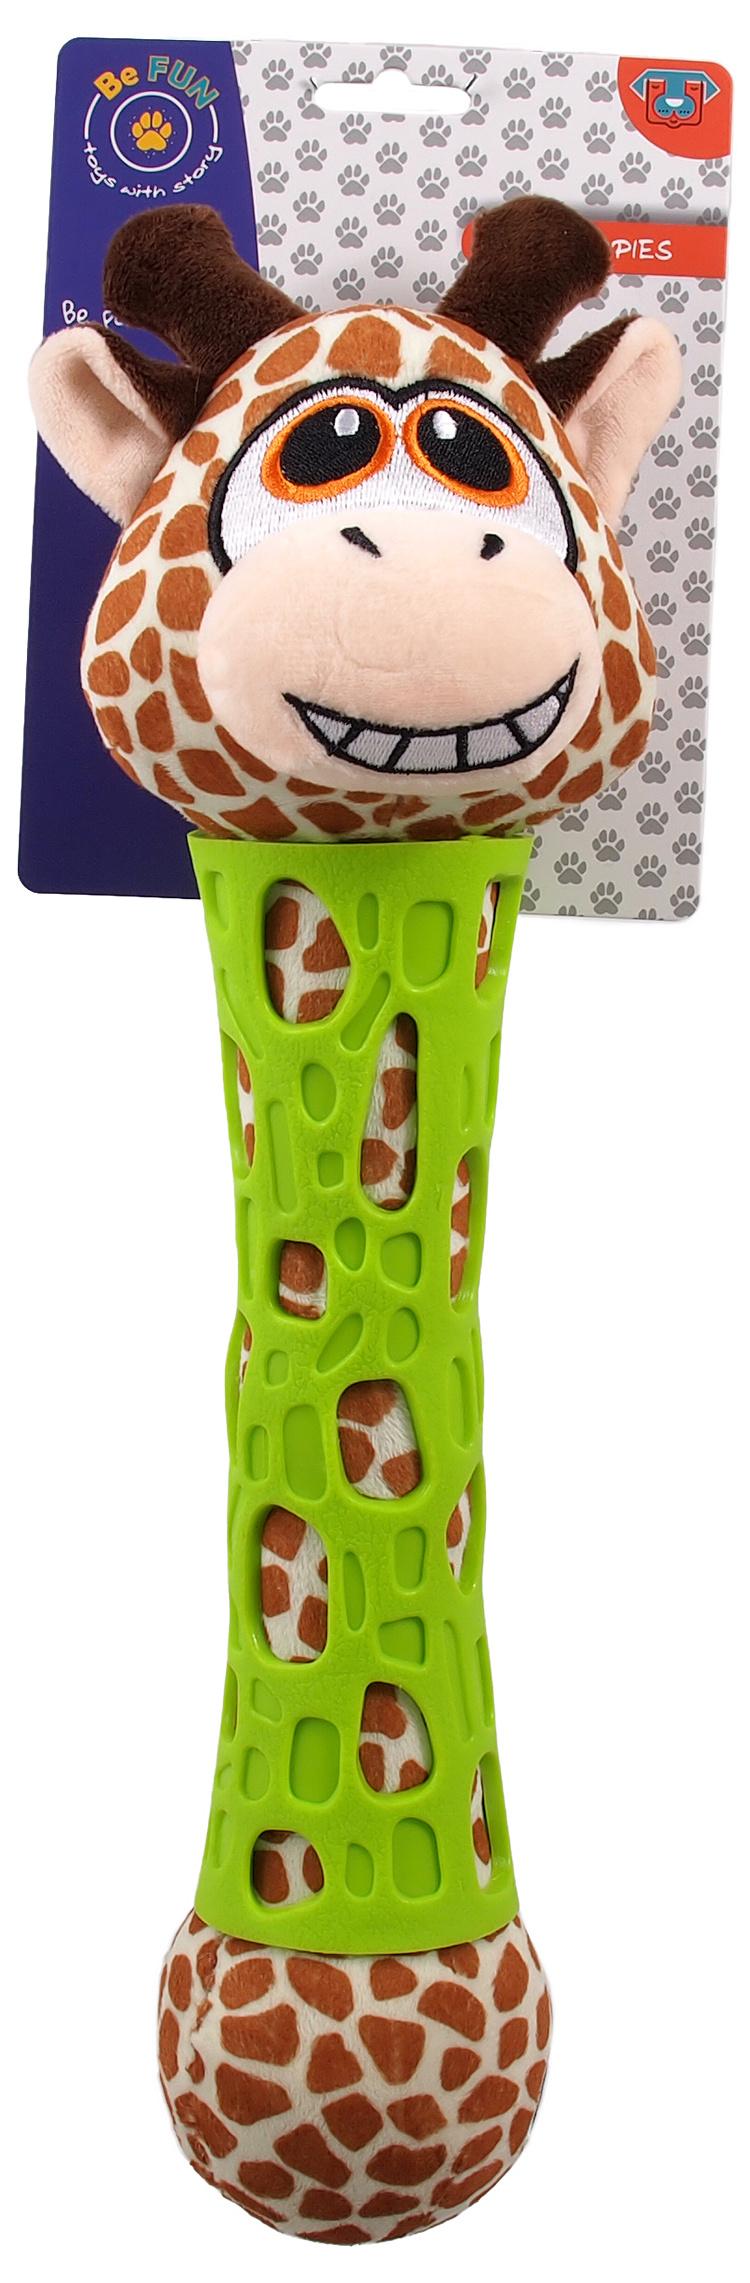 Hračka BeFun TPR+plyš puppy žirafa 39cm